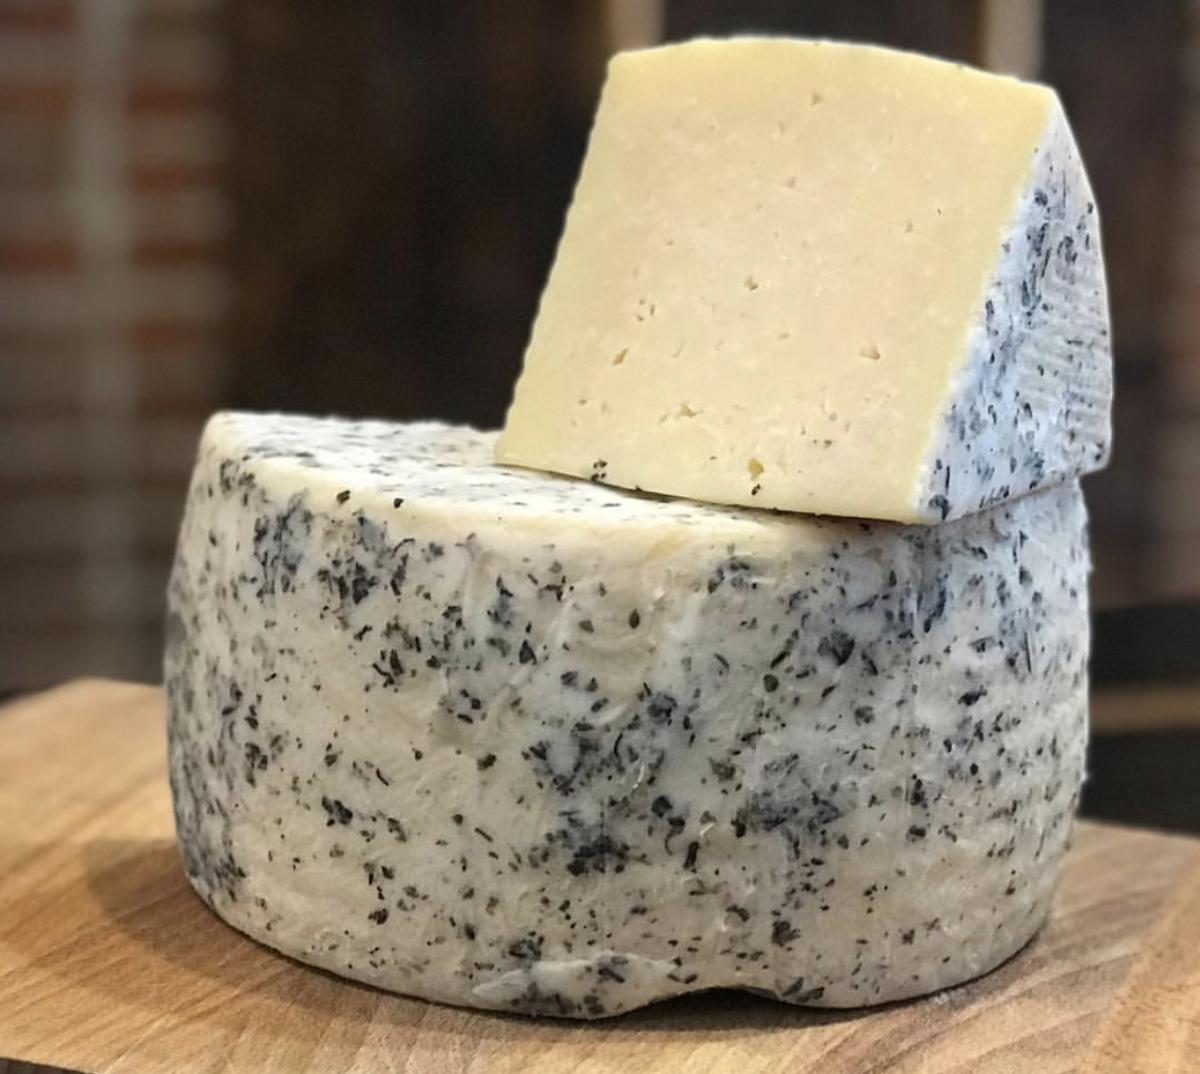 Welsh Rabbit Cheese